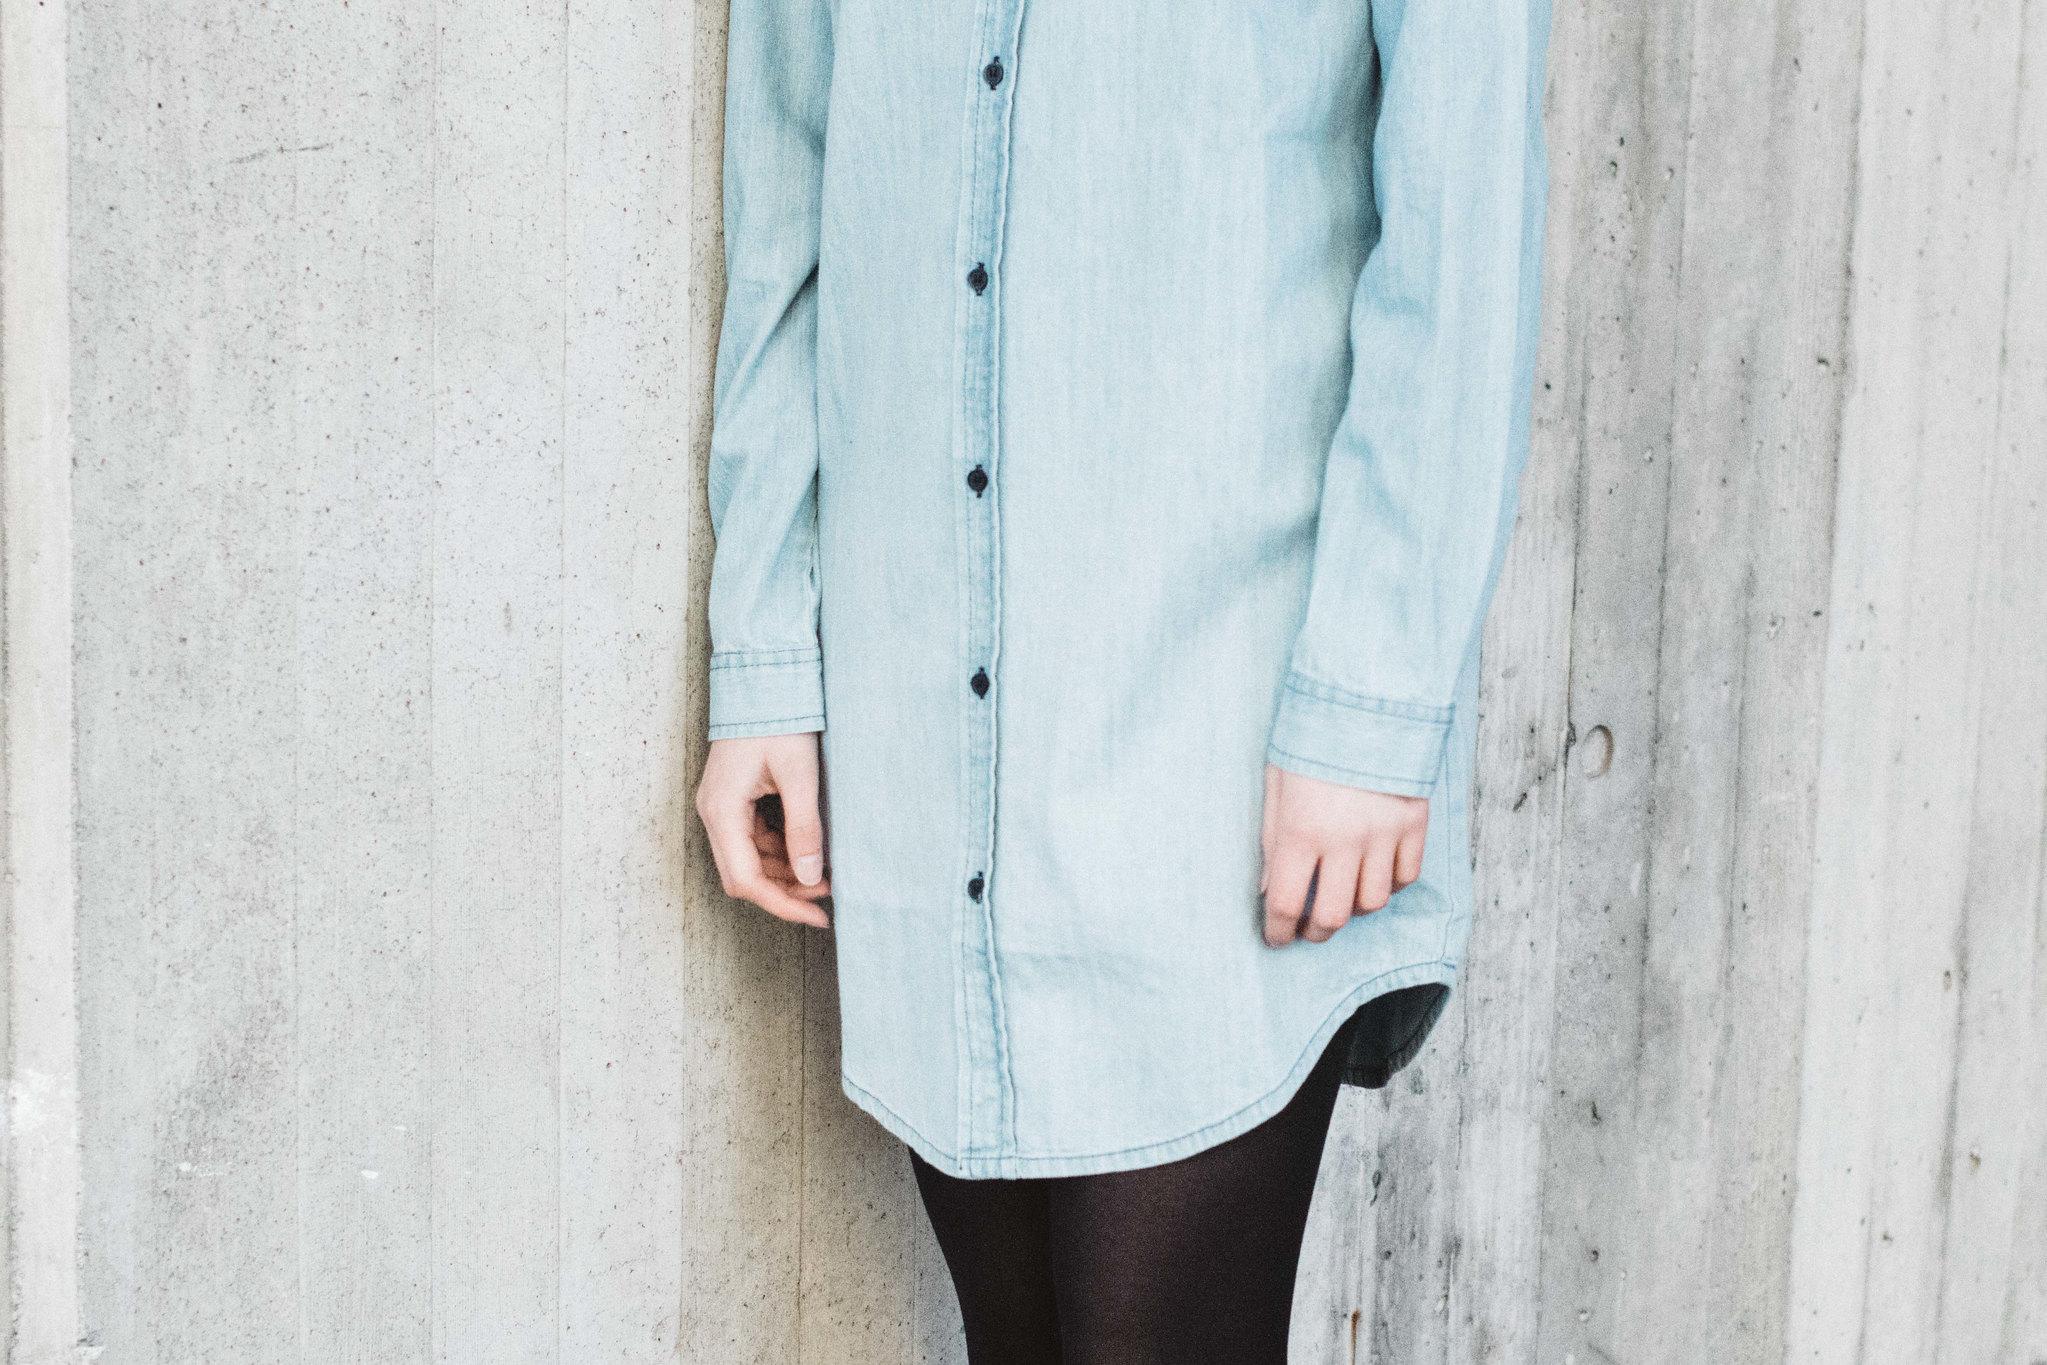 Denim Shirt Dress for Oonas shot by Lauren O'Neil on juliettelaura.blogspot.com